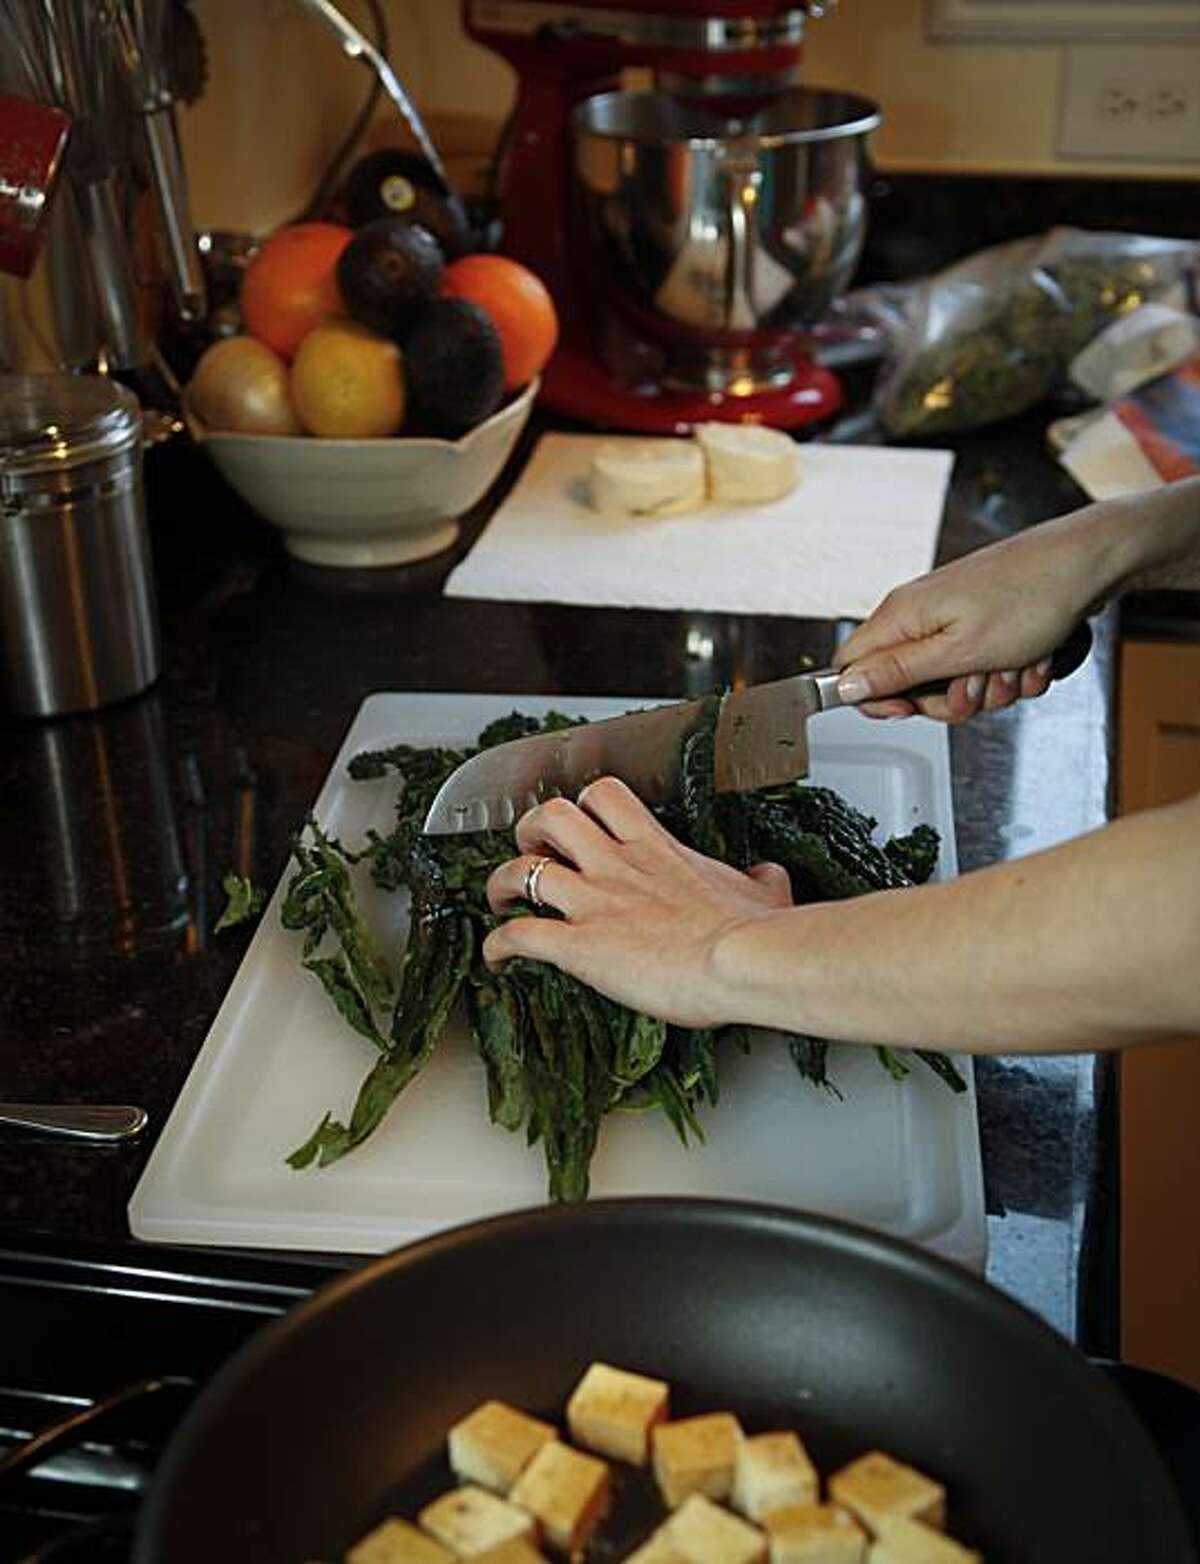 Chronicle Food writer Amanda Gold prepares a weeknight meal of Seared Tofu and Crispy Kale Salad on Monday, Jan. 31, 2011 in San Francisco, Calif.